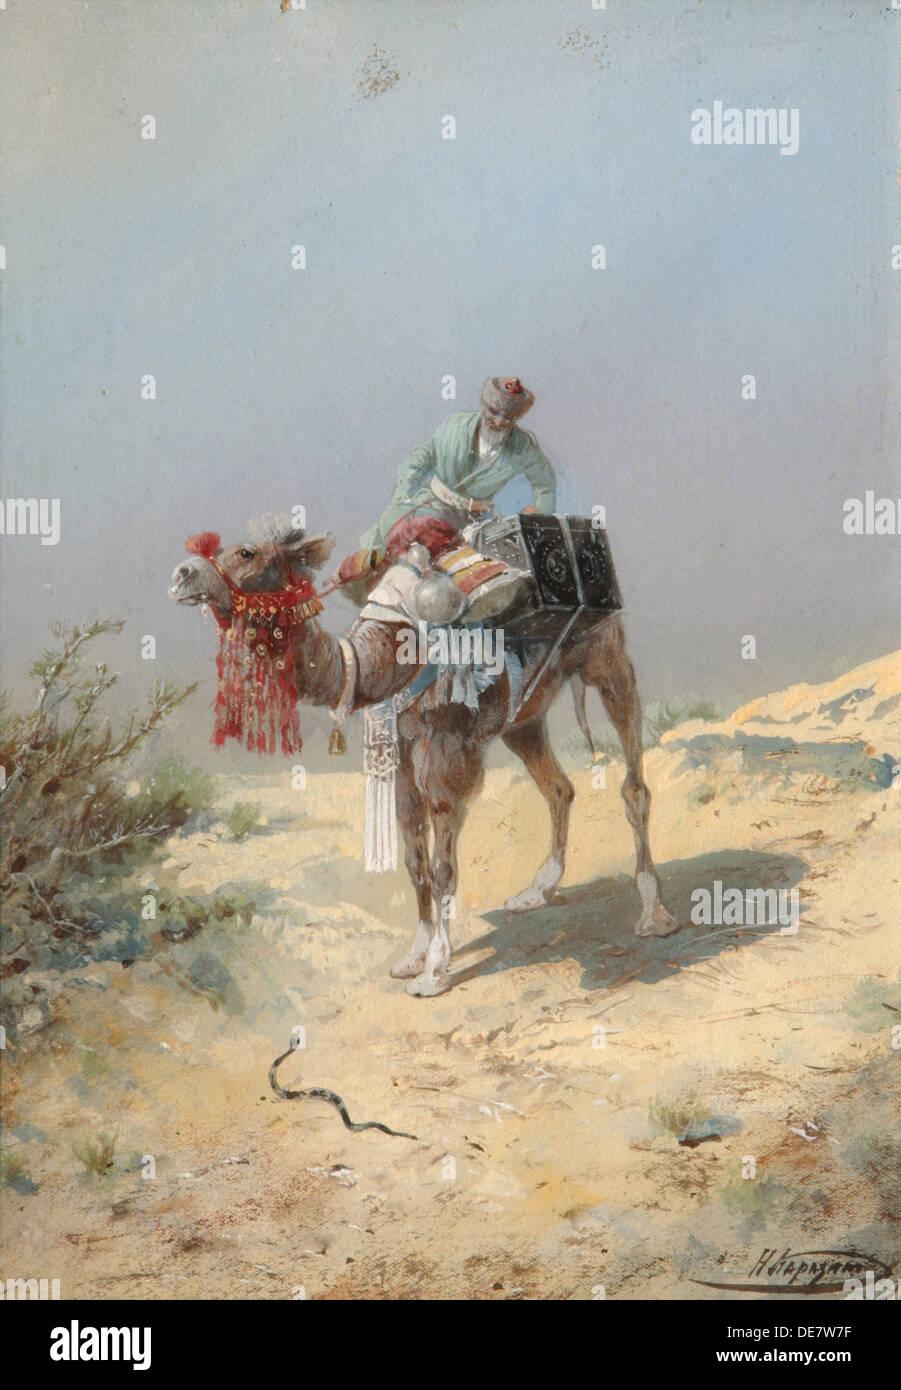 In the Desert. Artist: Karasin, Nikolai Nikolayevich (1842-1908) - Stock Image